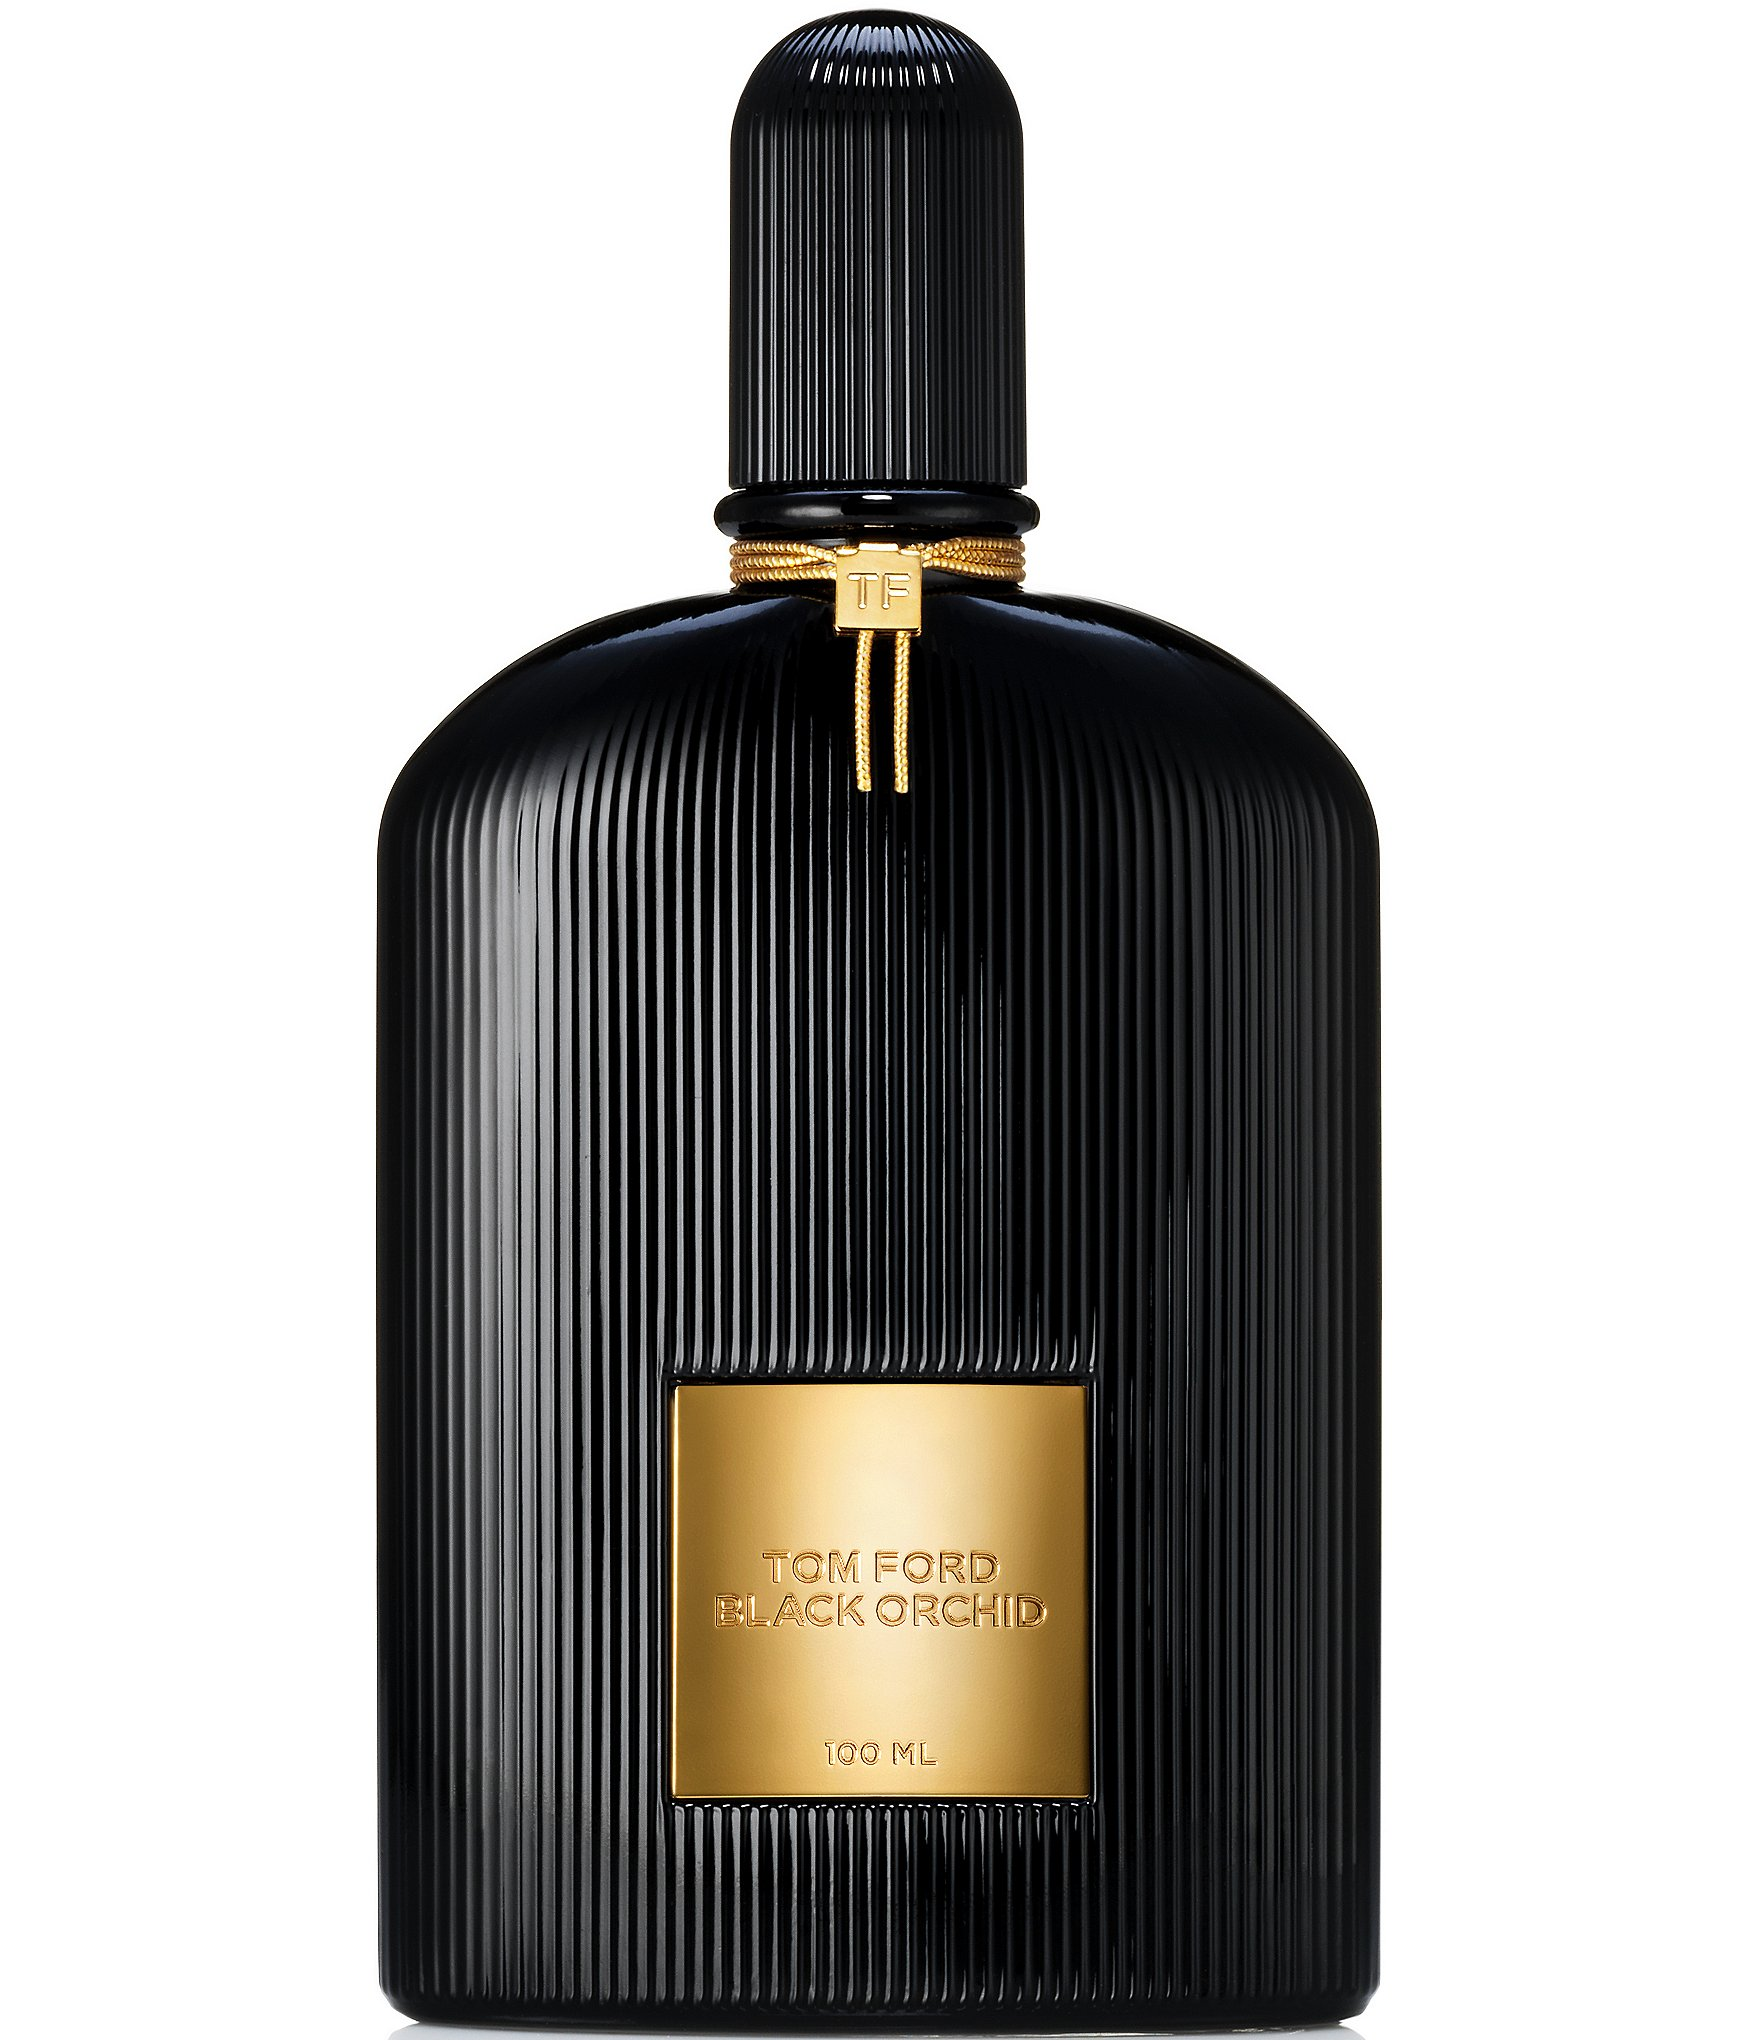 tom ford black orchid eau de parfum spray dillard 39 s. Black Bedroom Furniture Sets. Home Design Ideas